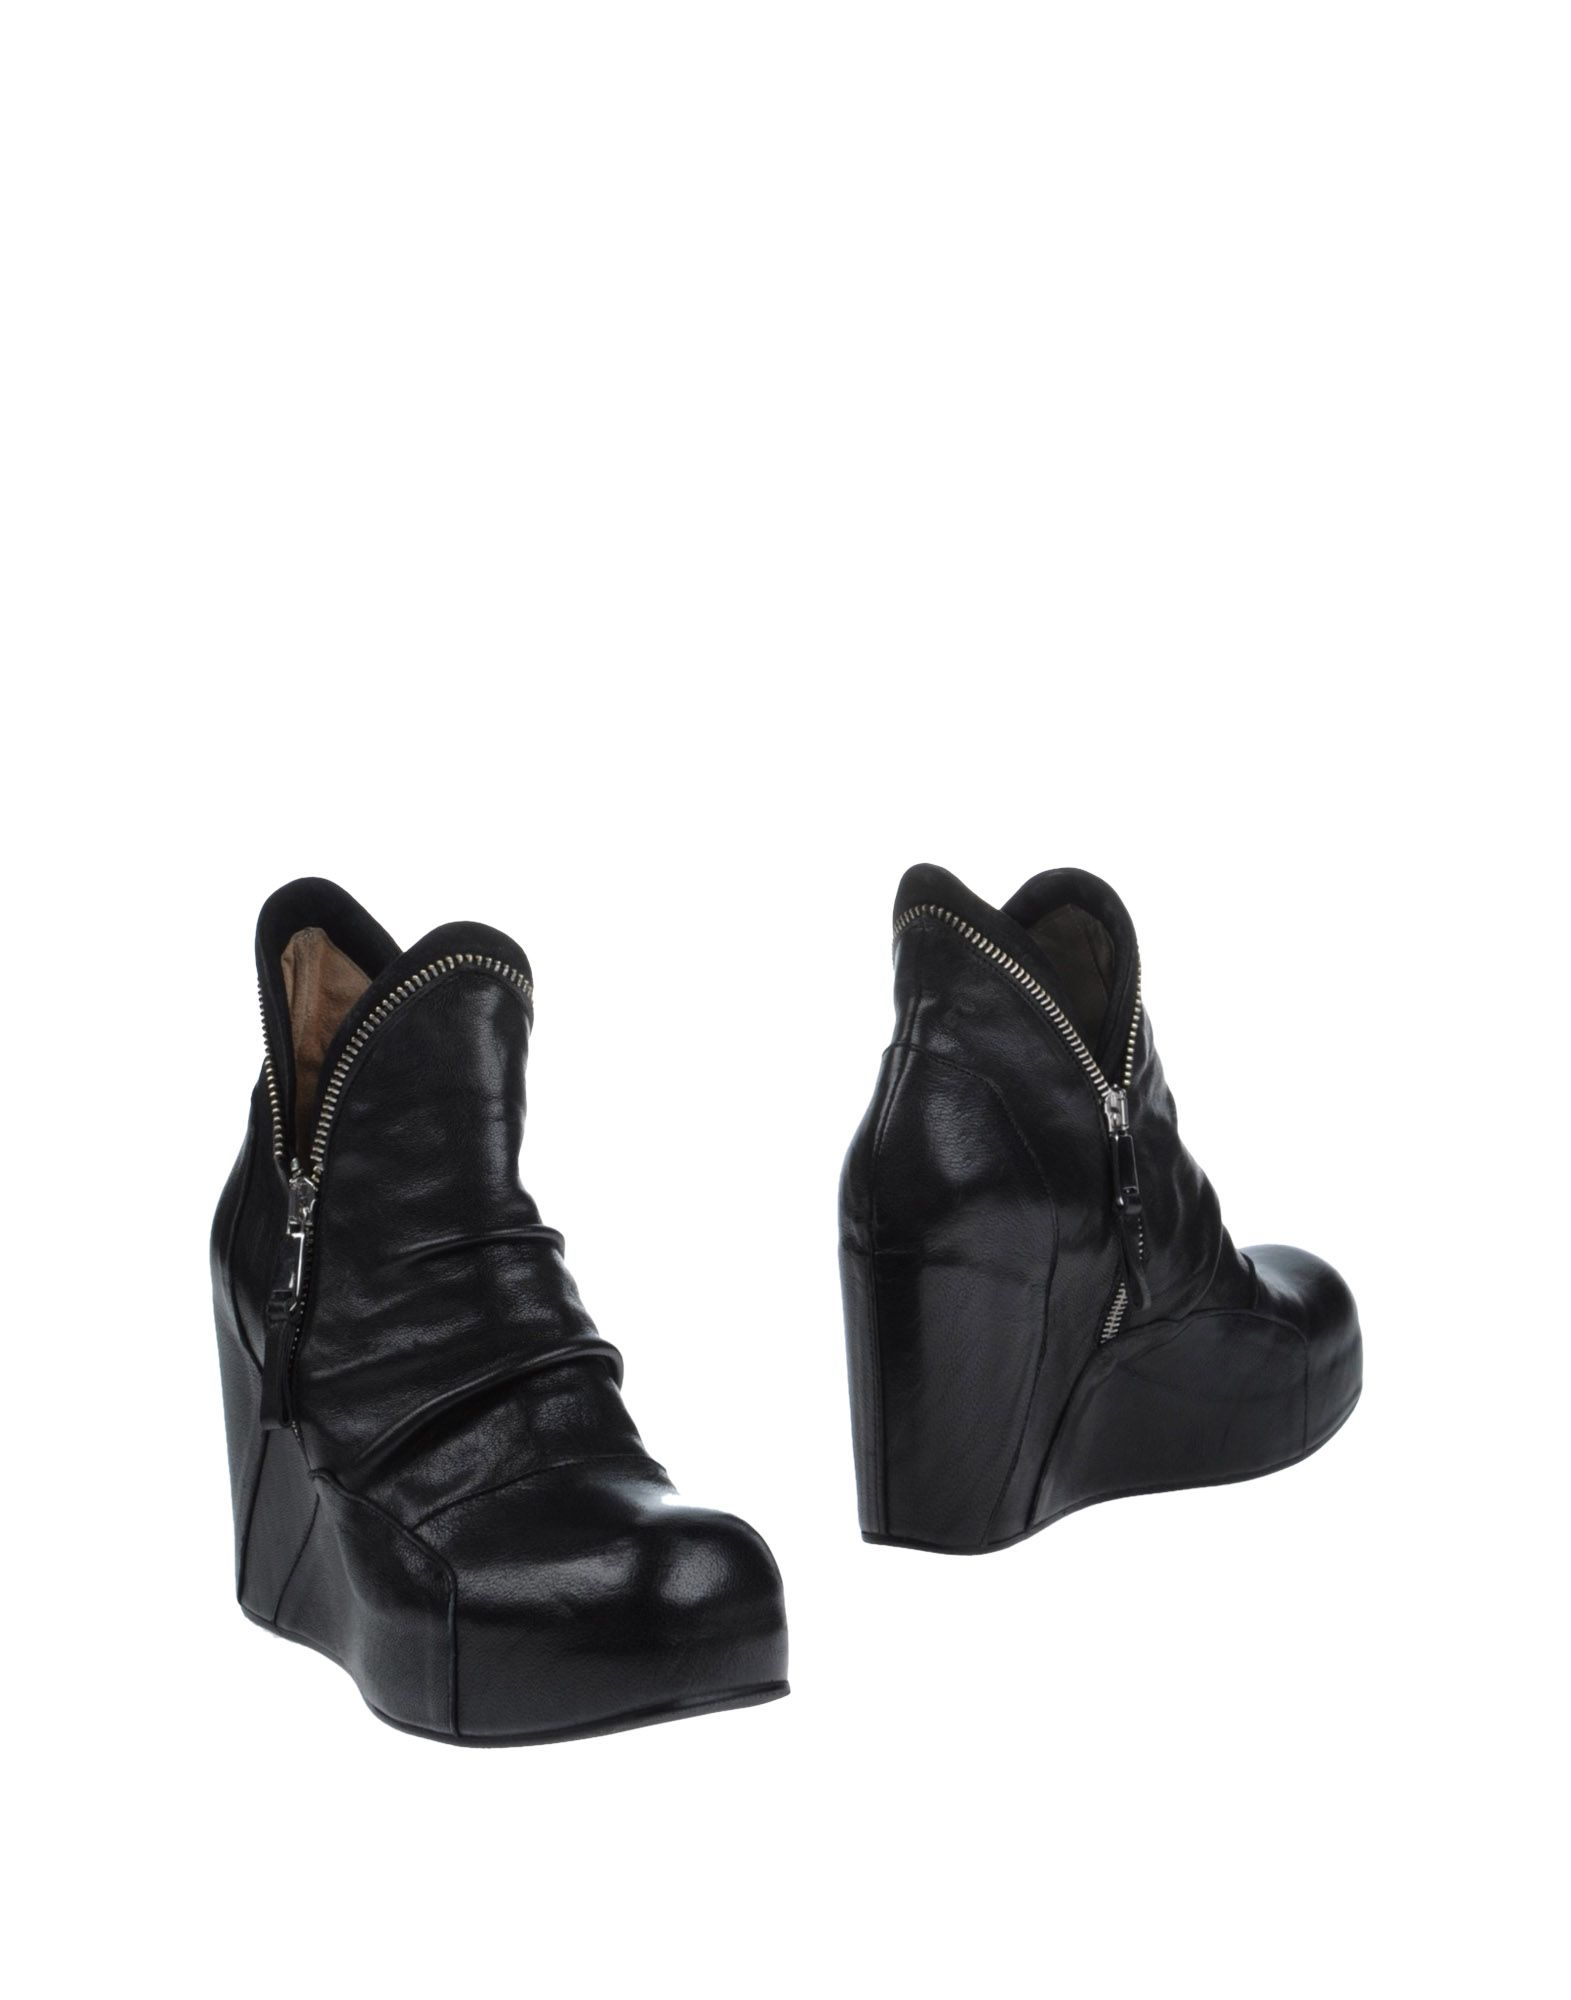 Ixos  Stiefelette Damen  Ixos 11264990FWGut aussehende strapazierfähige Schuhe 5d5faf